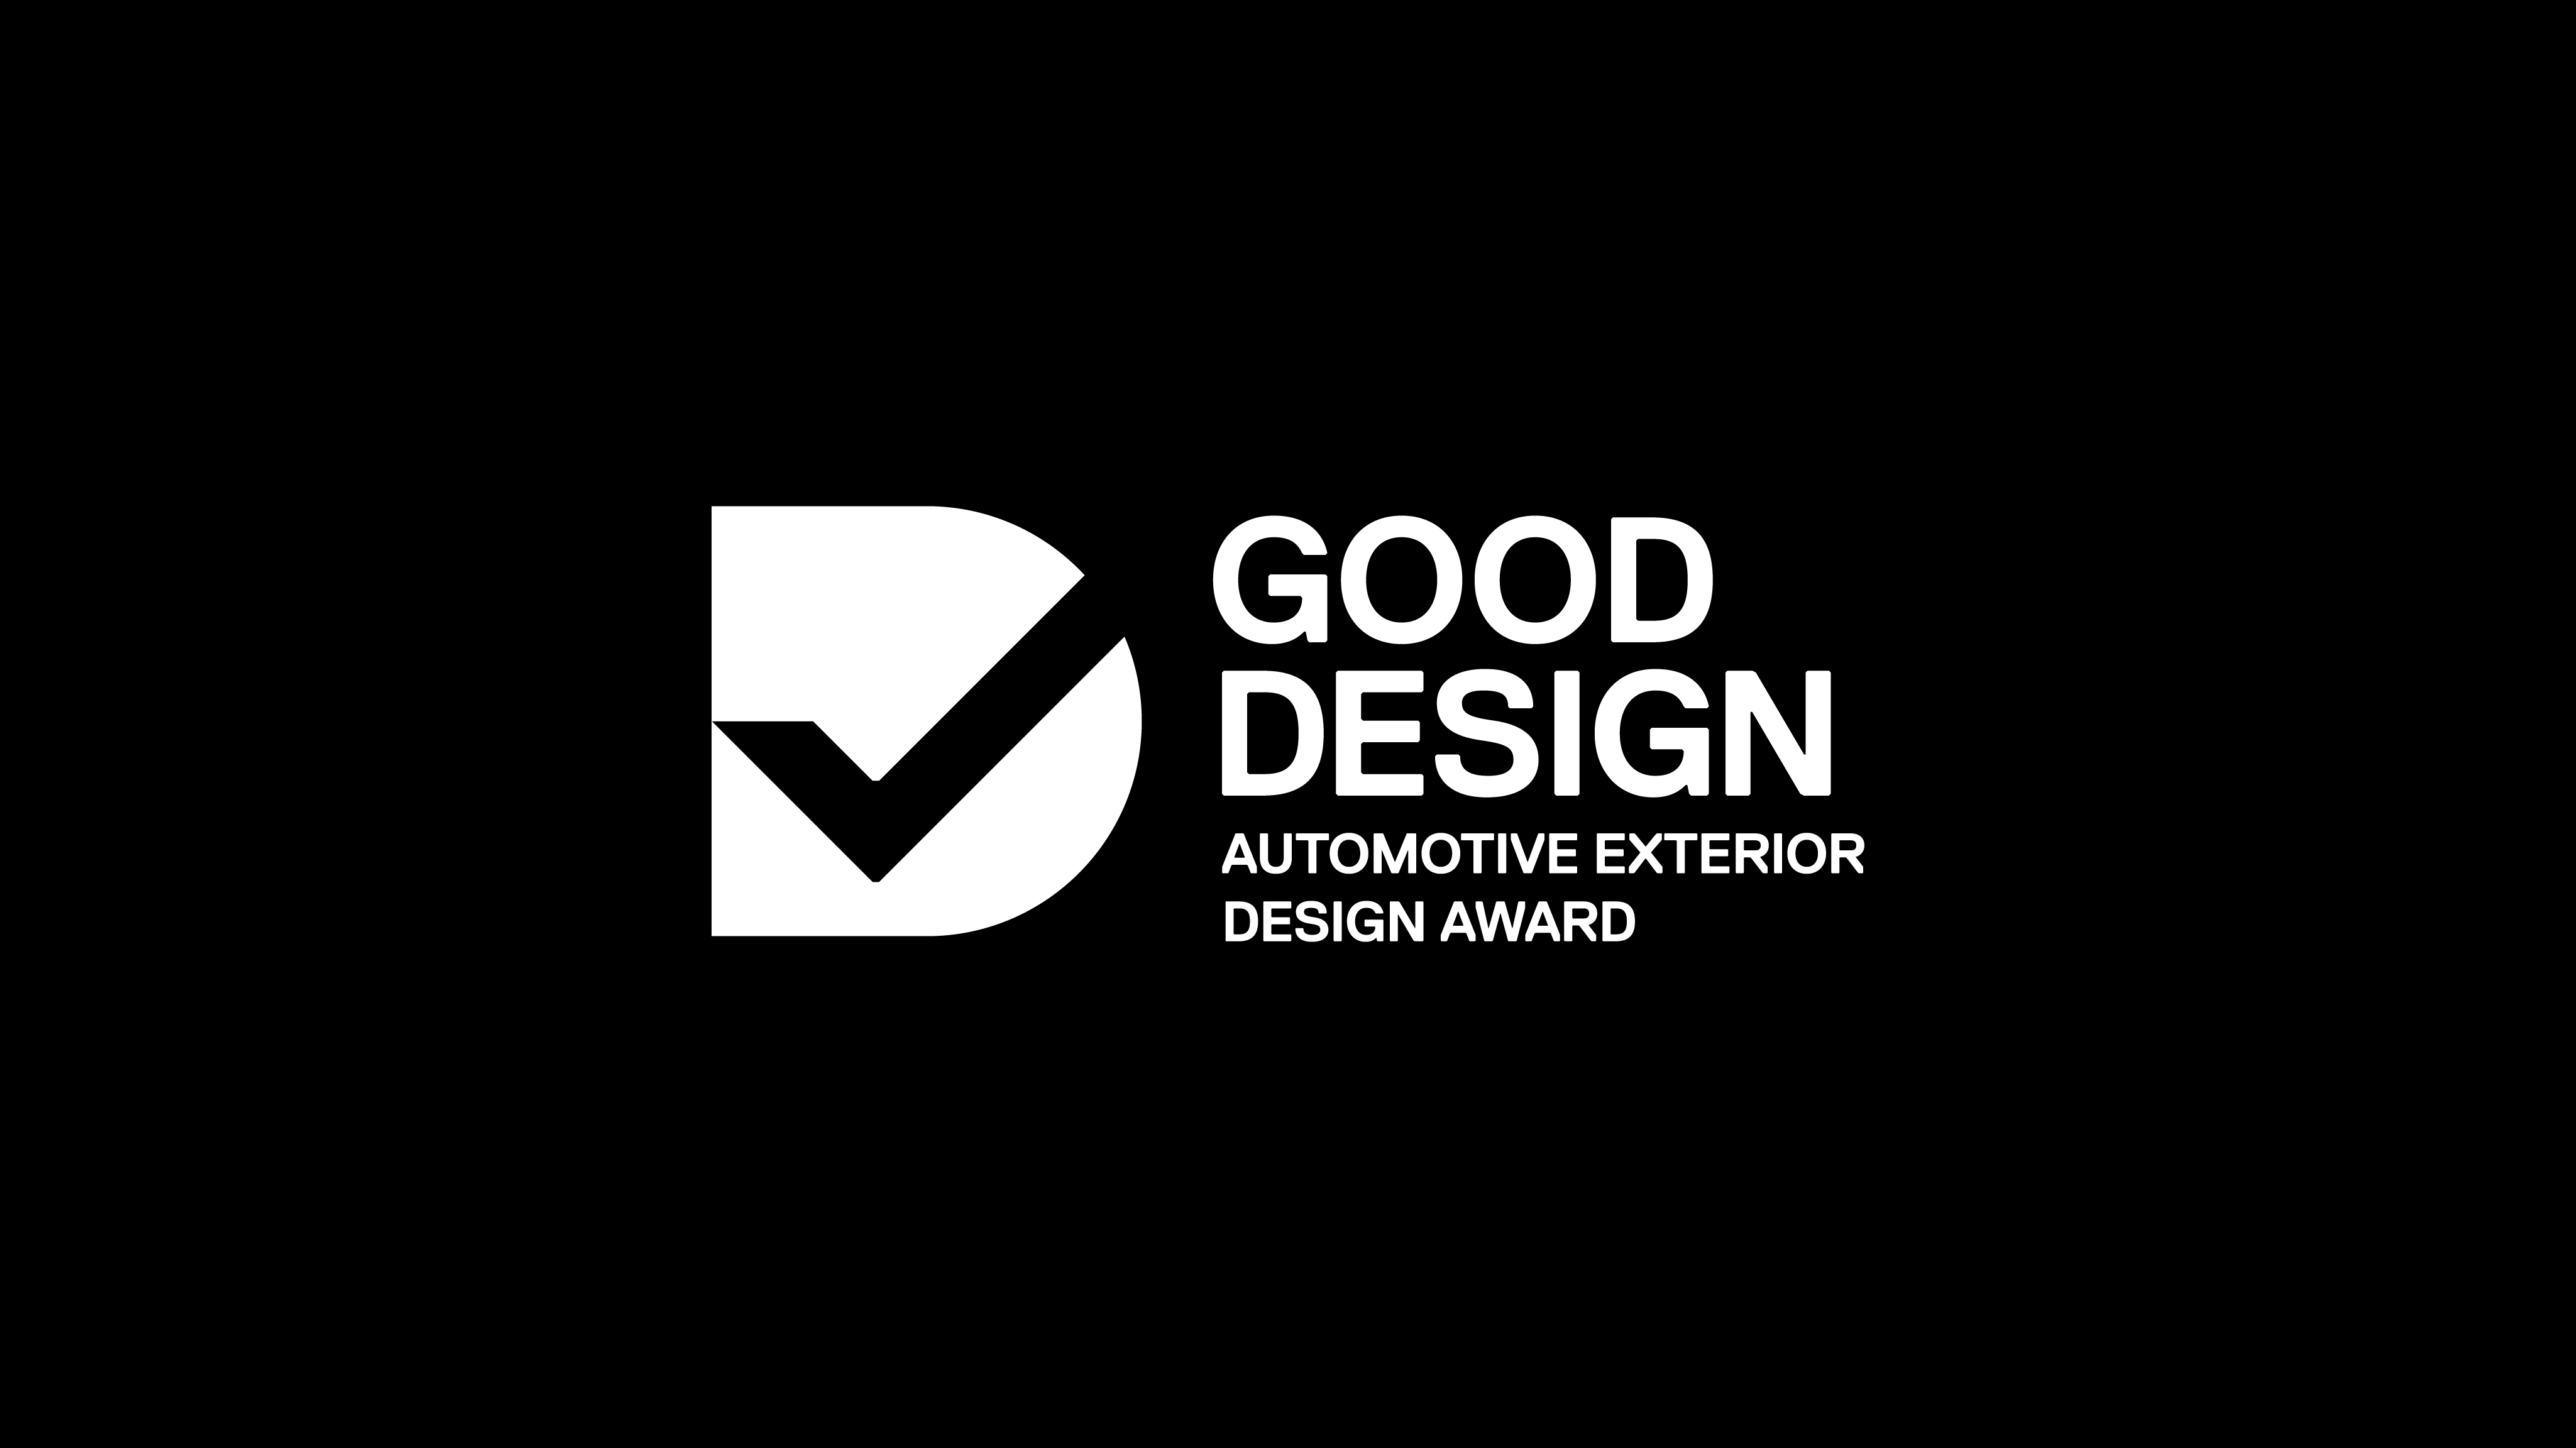 Exterior Automotive Design Award